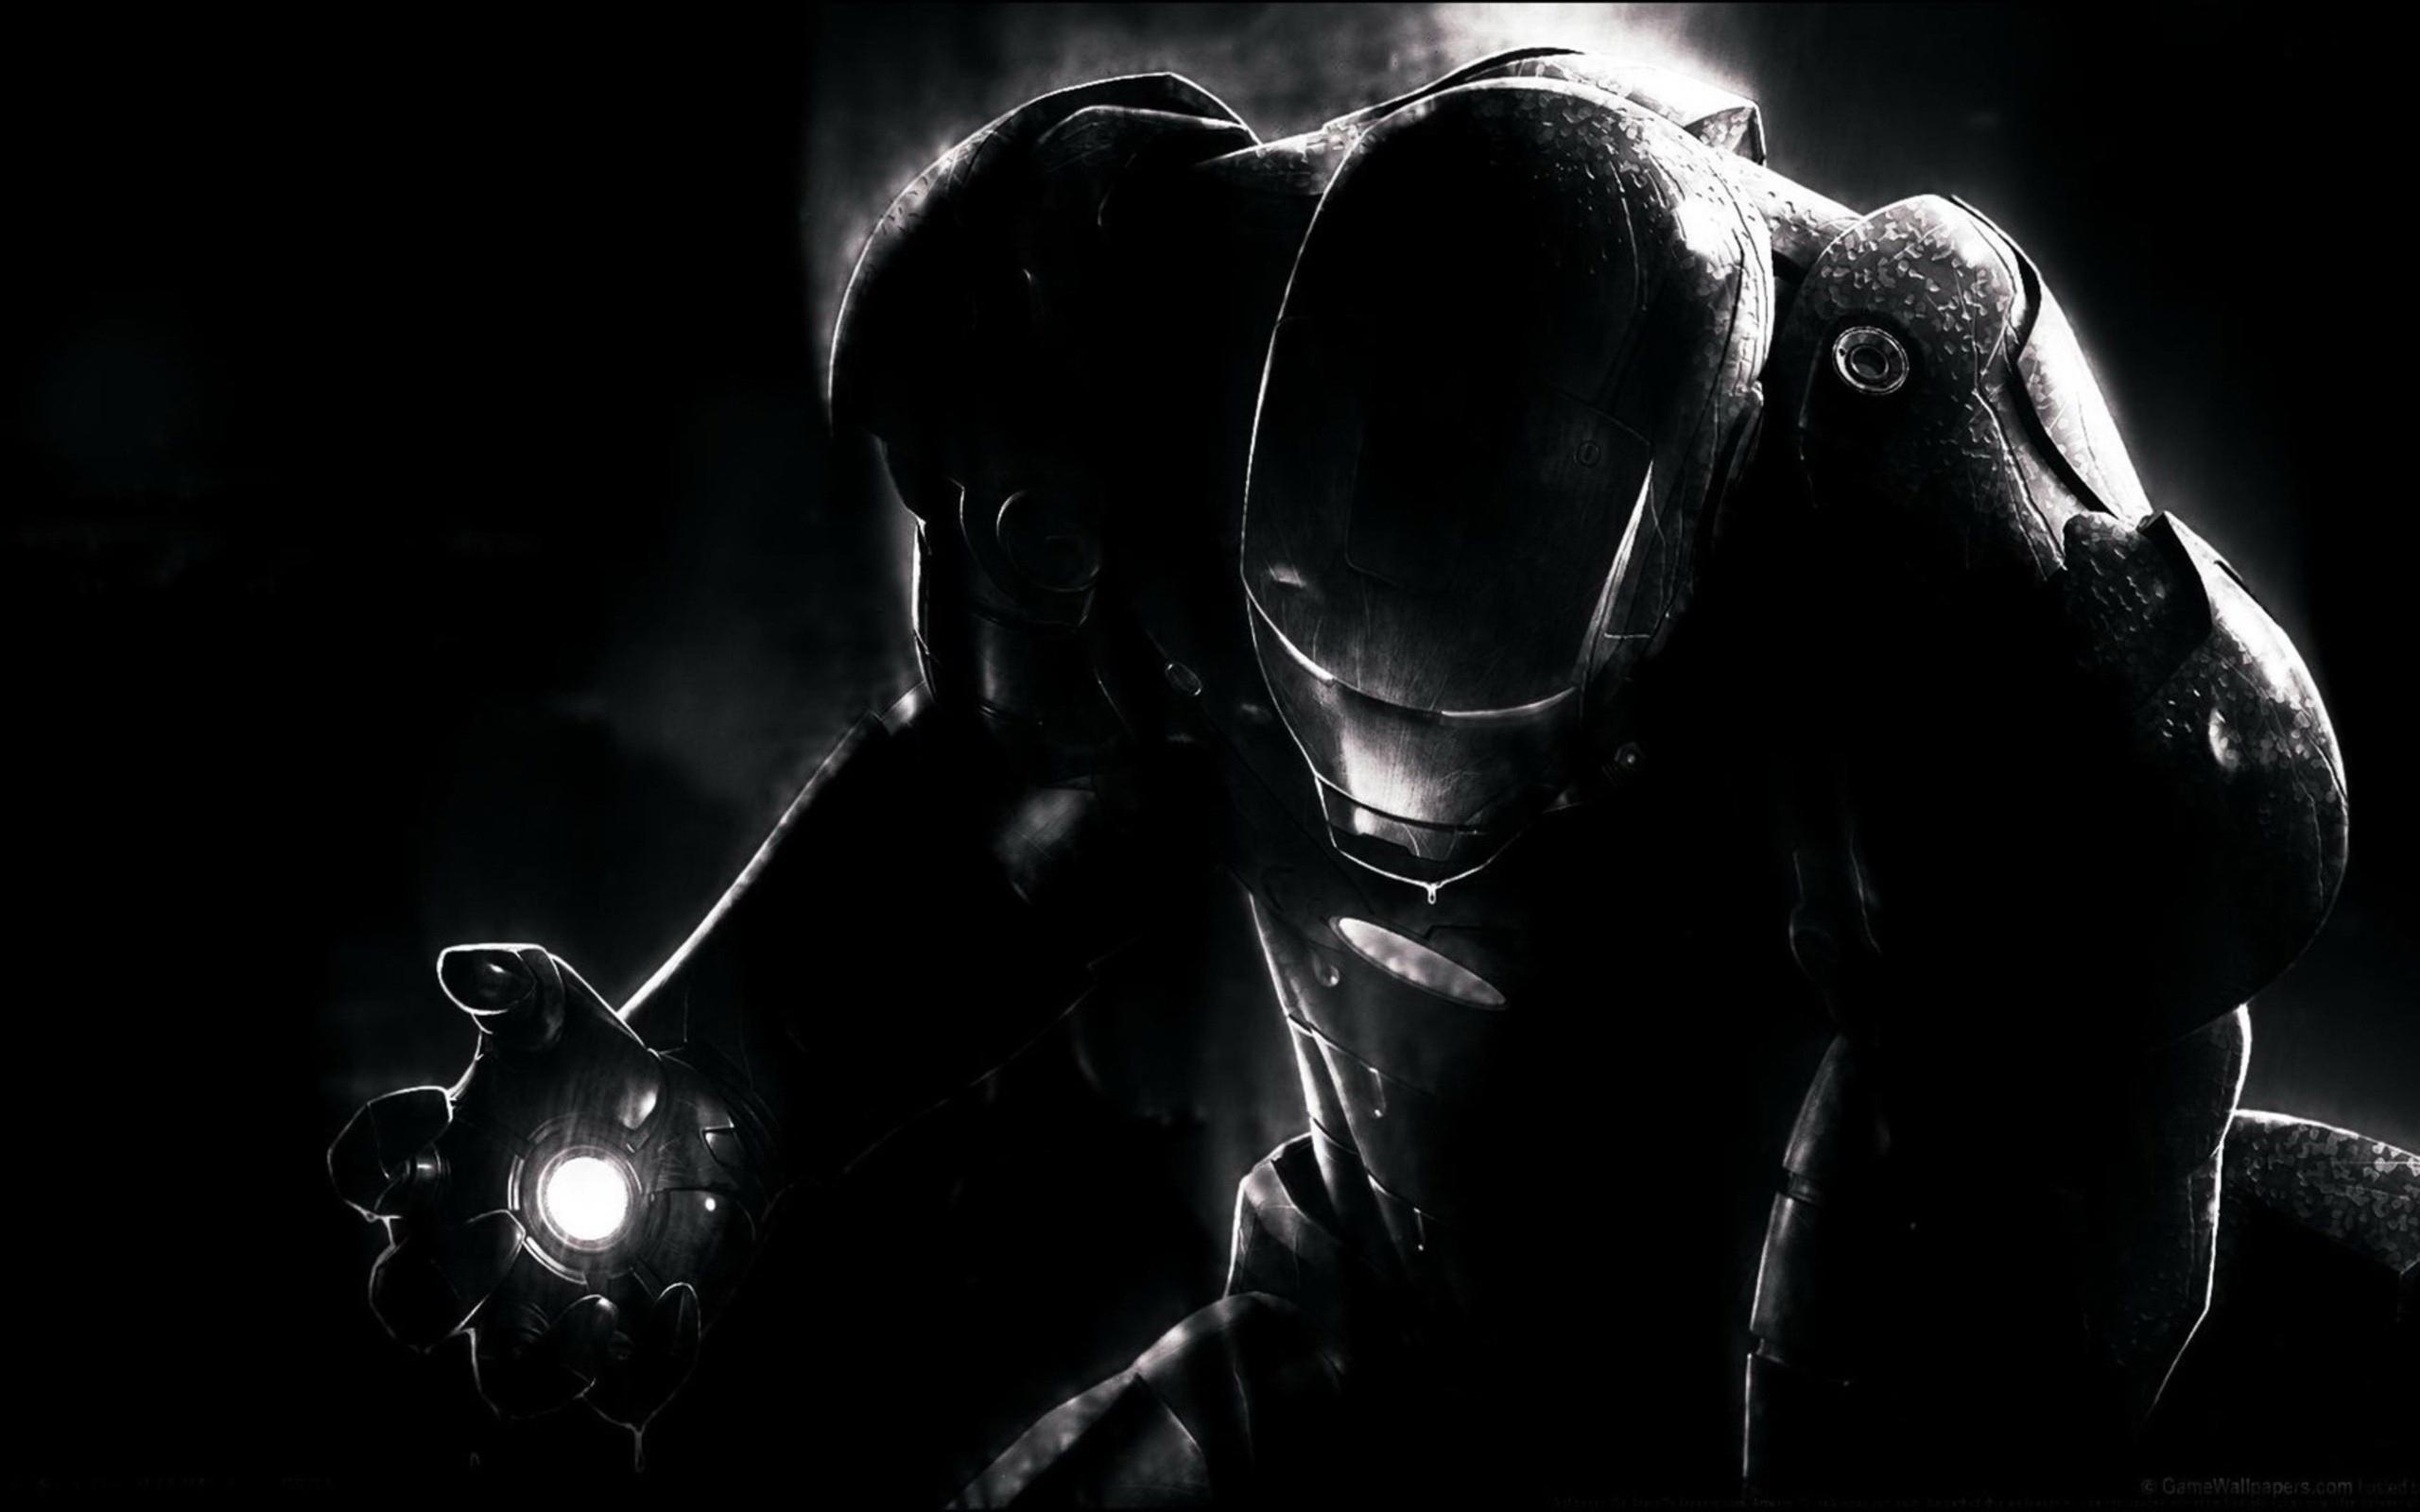 Iron Man Hd Wallpaper Background Image 2560x1600 Id 361856